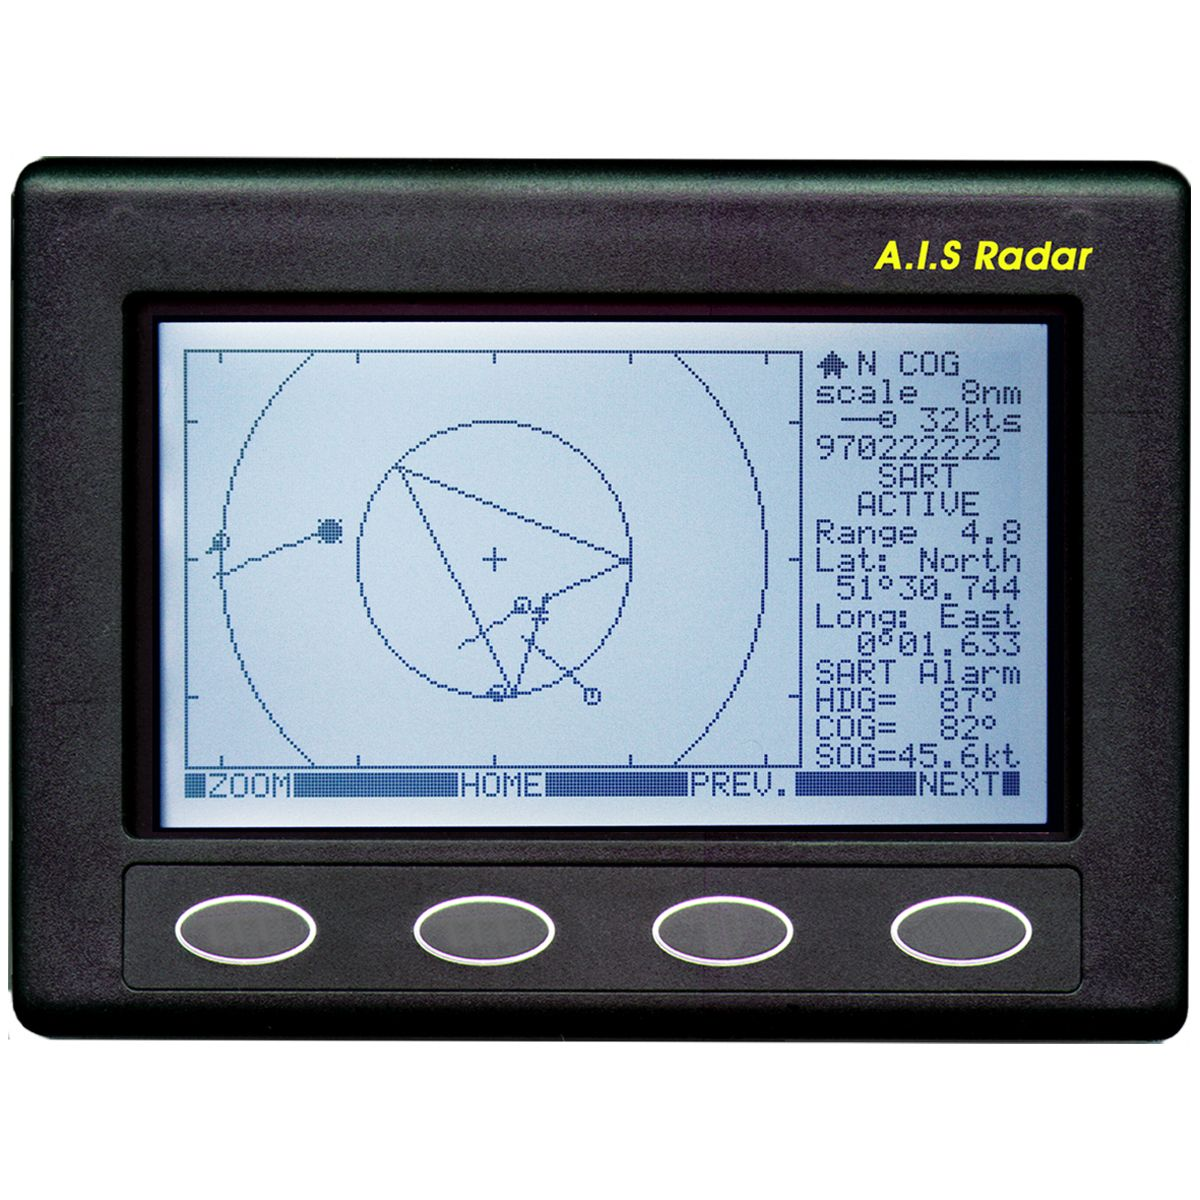 AIS SCART RADAR ais sart plotter nasa marine instruments nasa ais engine wiring diagram at gsmx.co